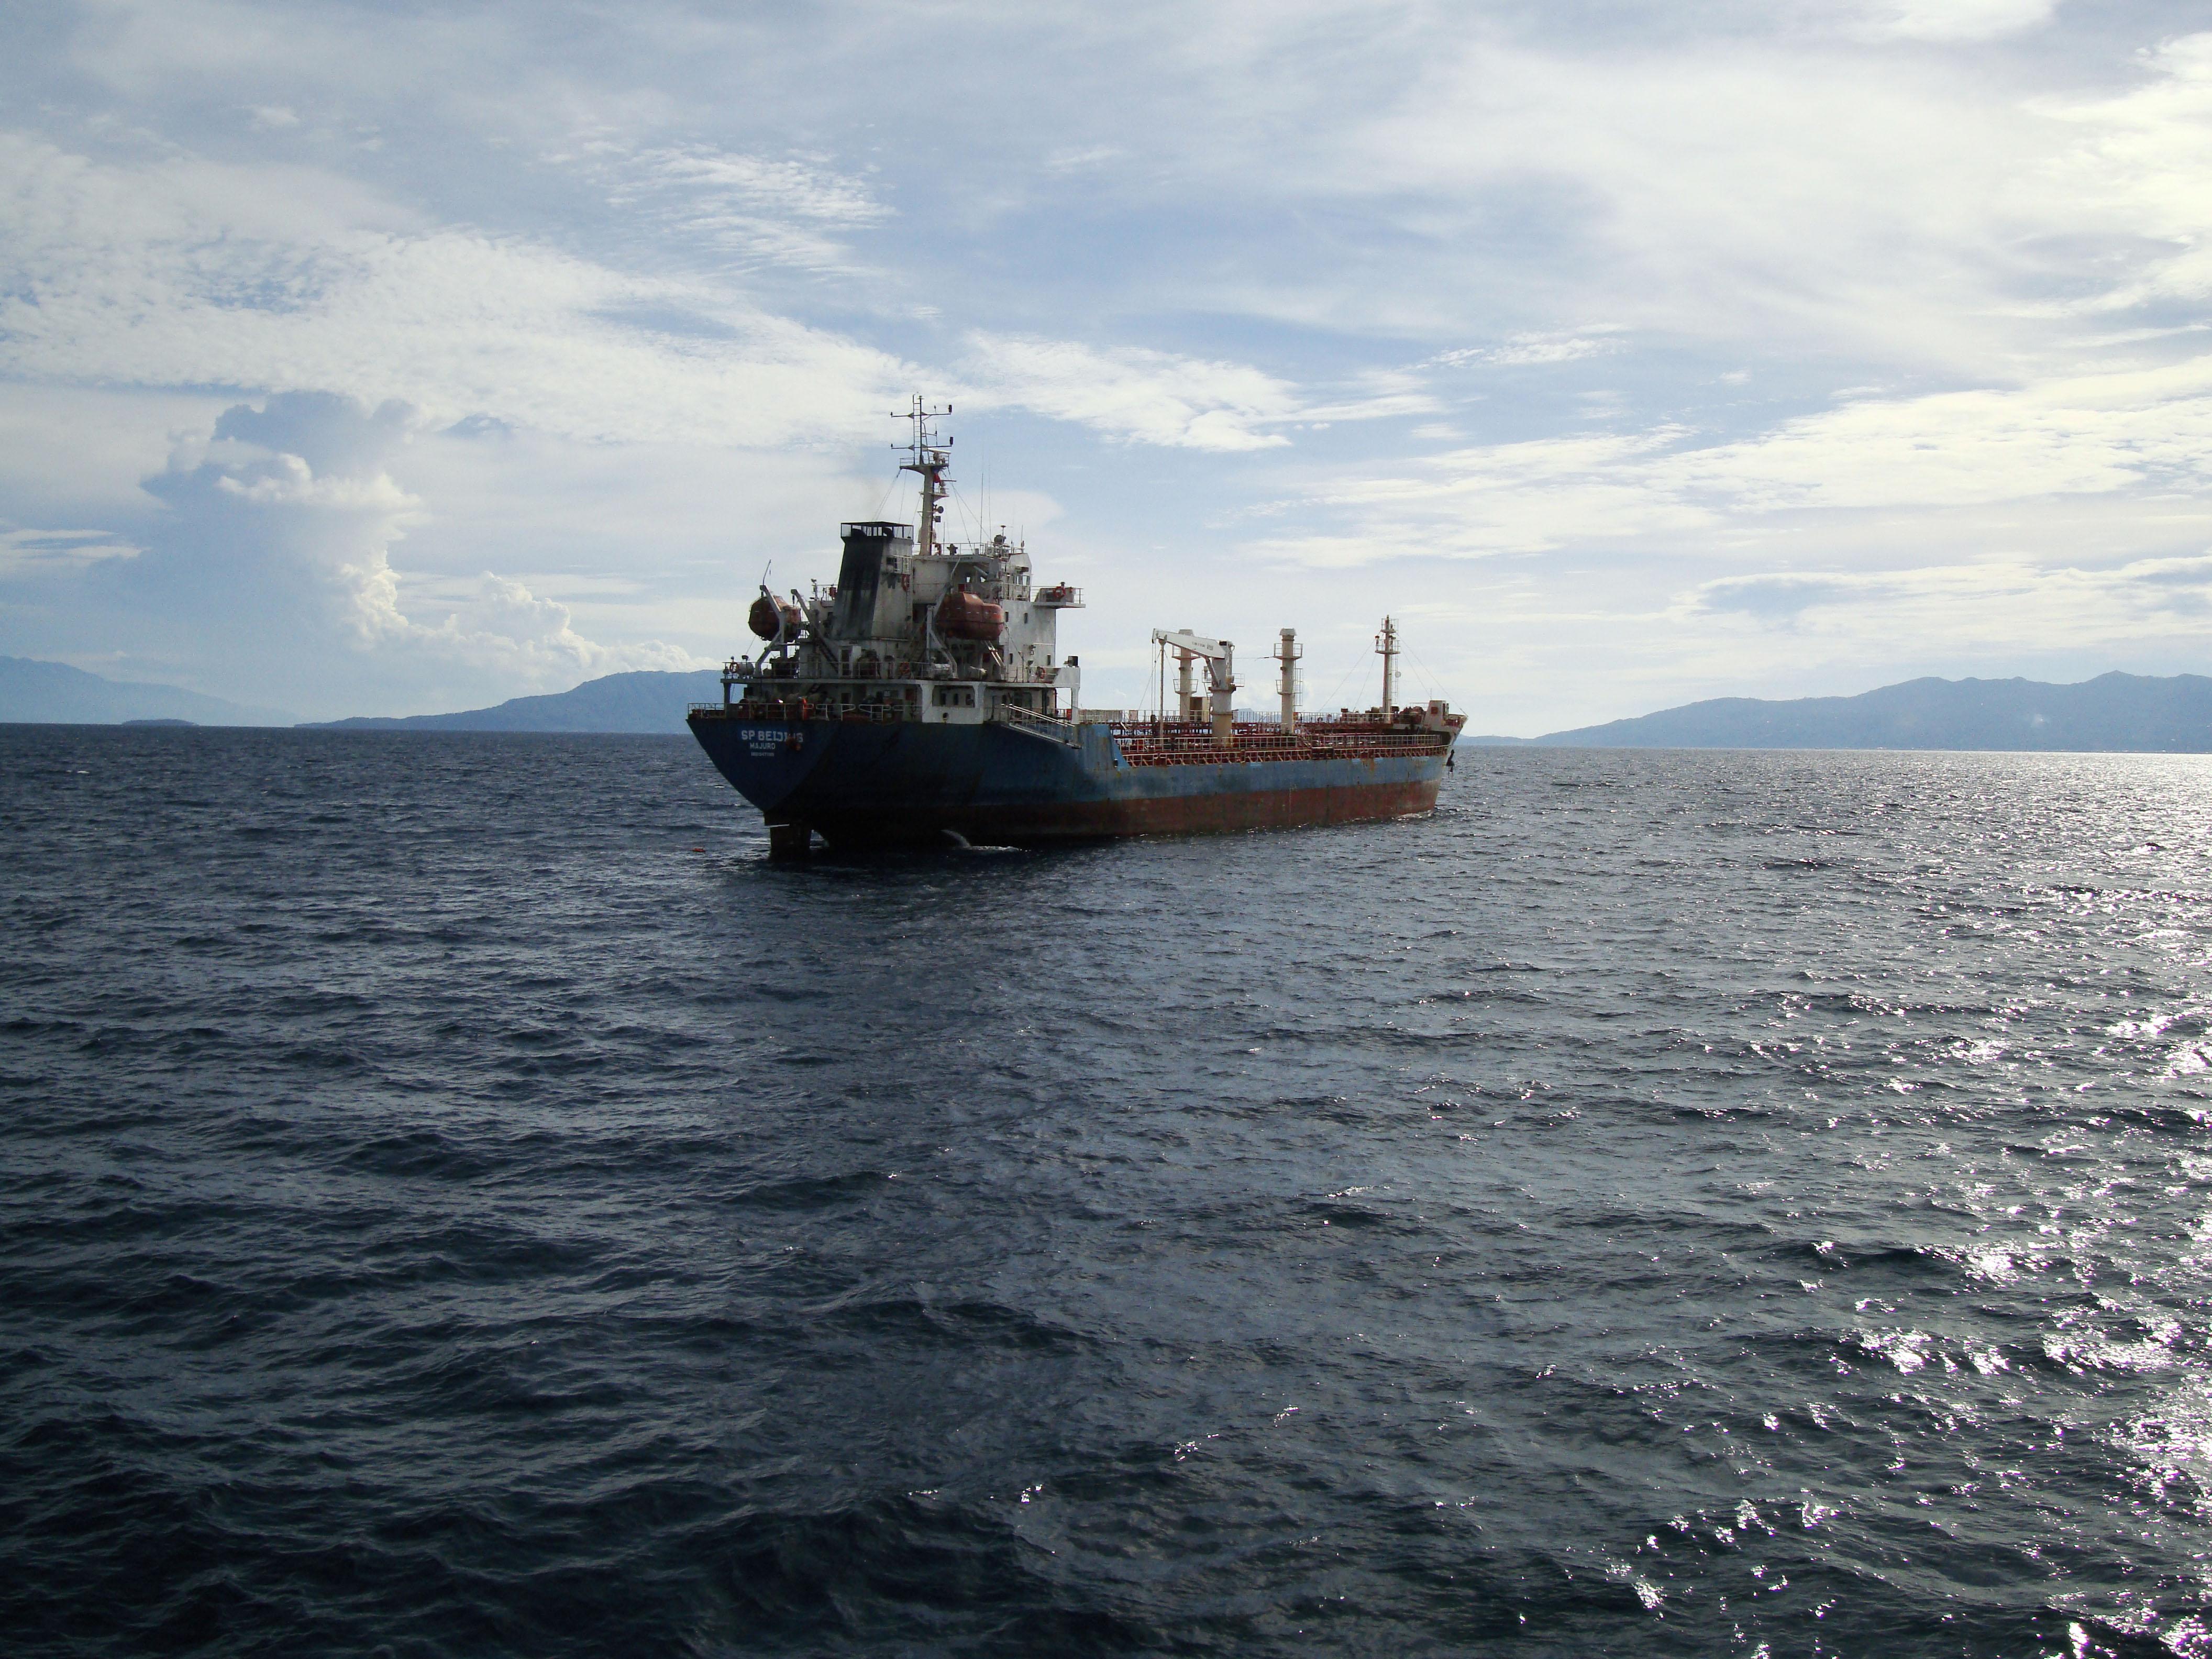 IMO 9471185 Tanker SP Beijing Majuro Batangus Bay Philppines 2010 03